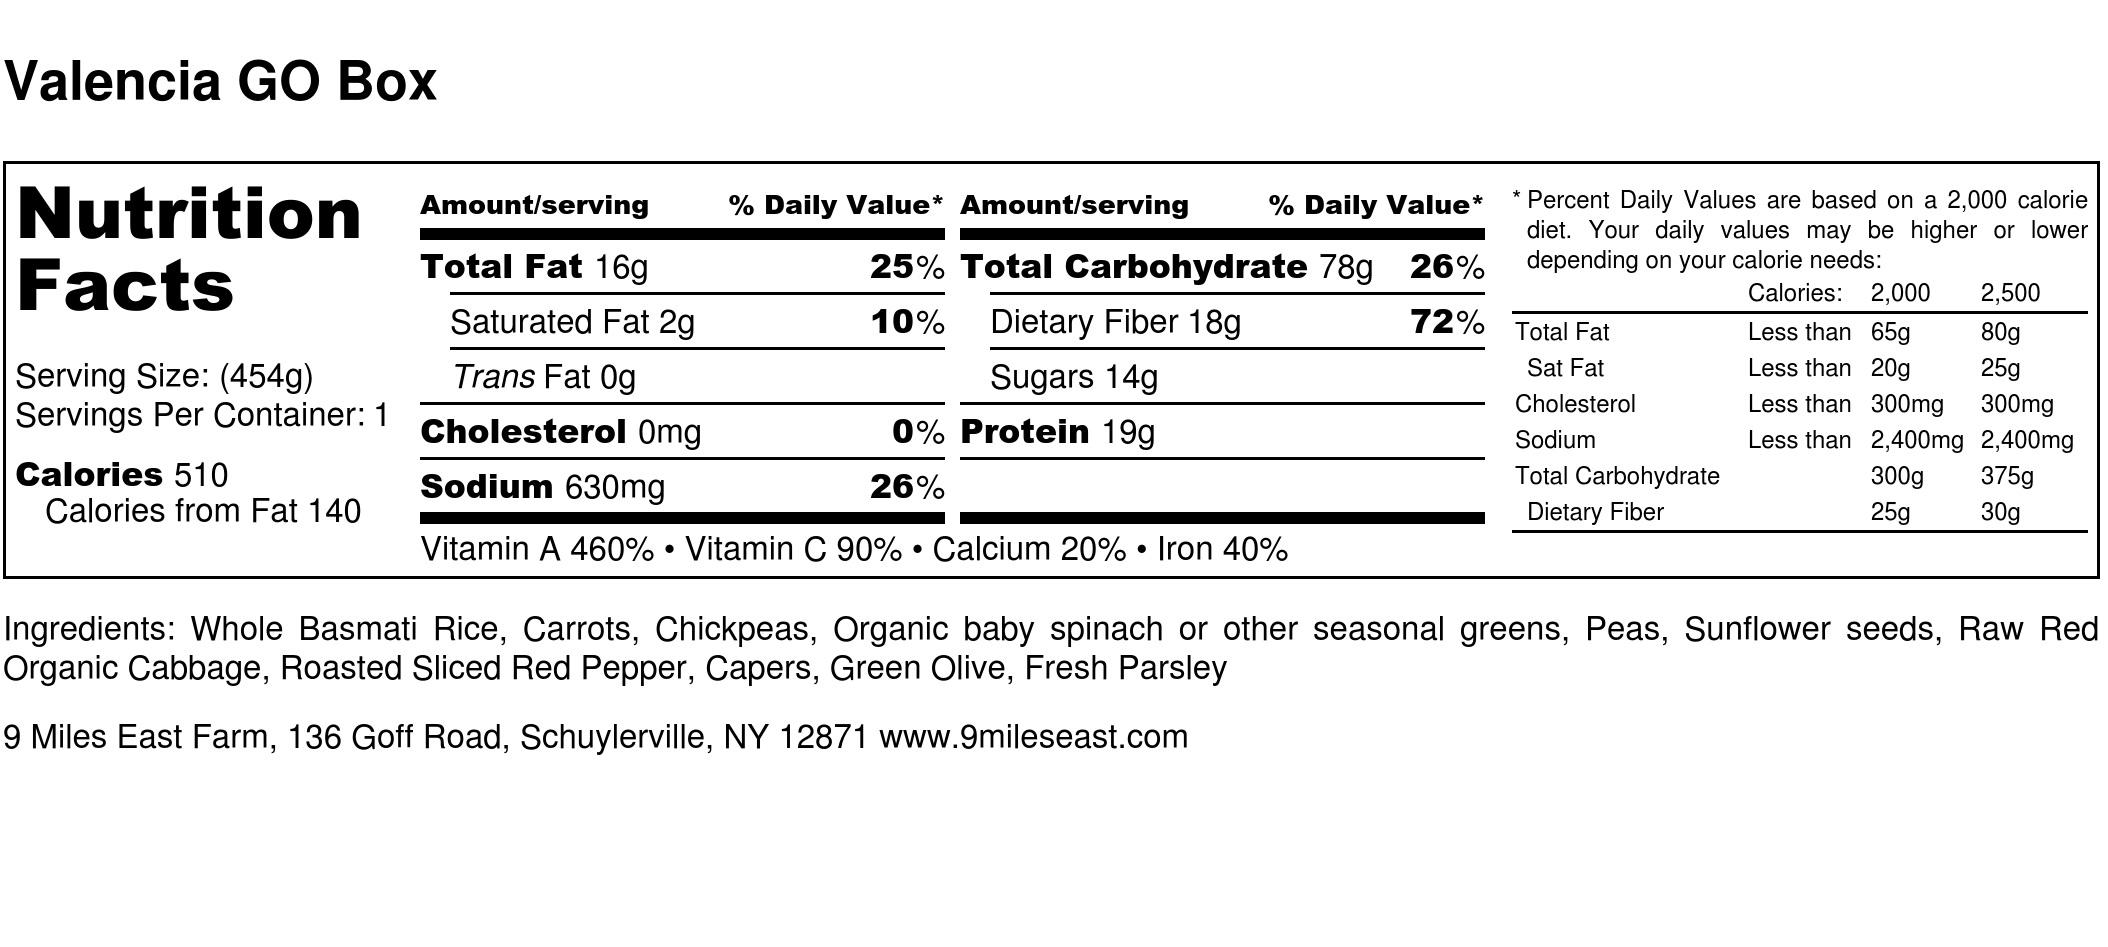 Valencia GO Box - Nutrition Label.jpg